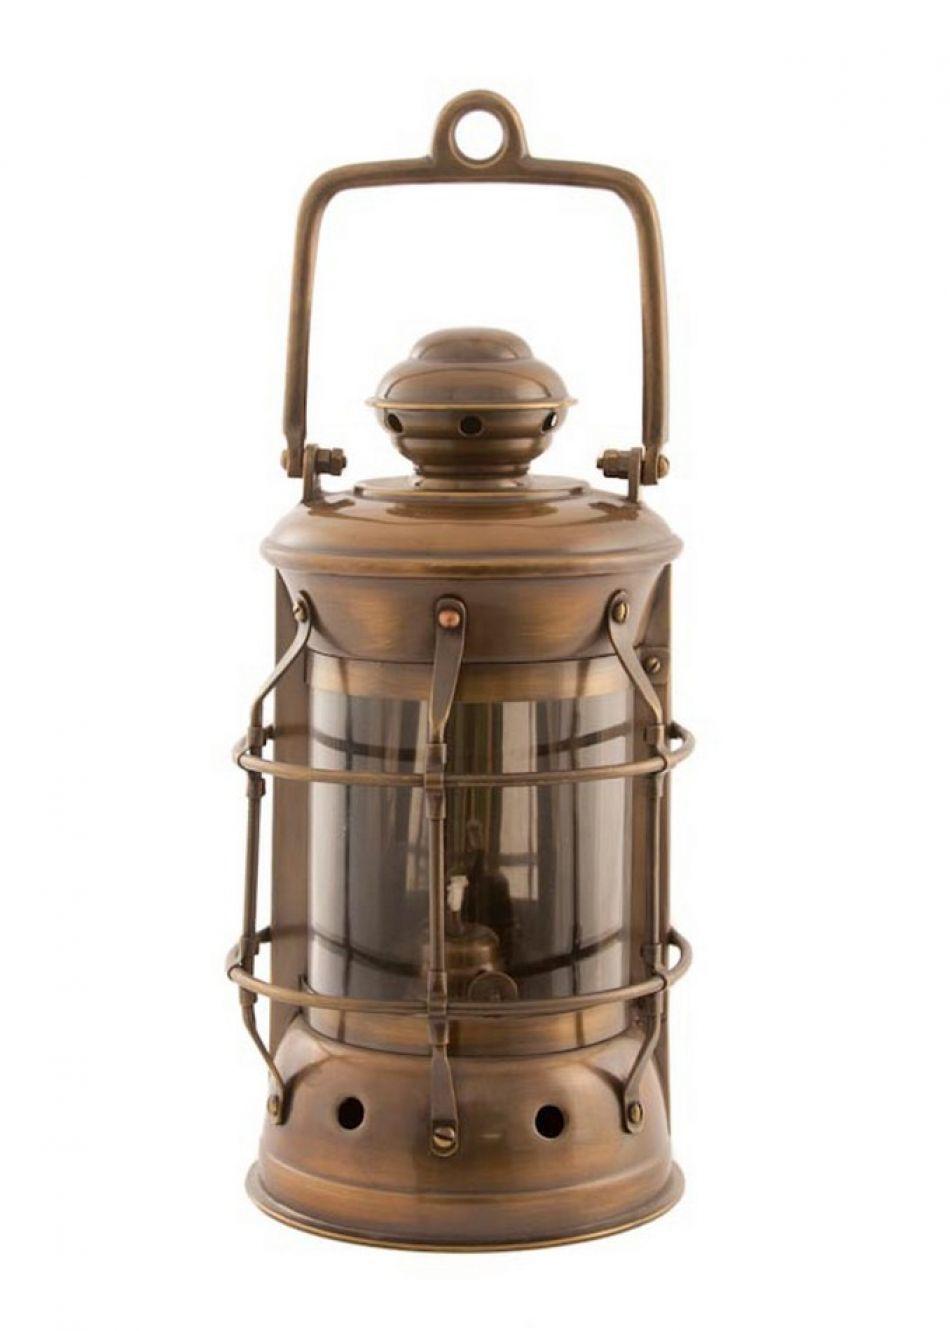 Antique Gas Lamp Restoration - YouTube